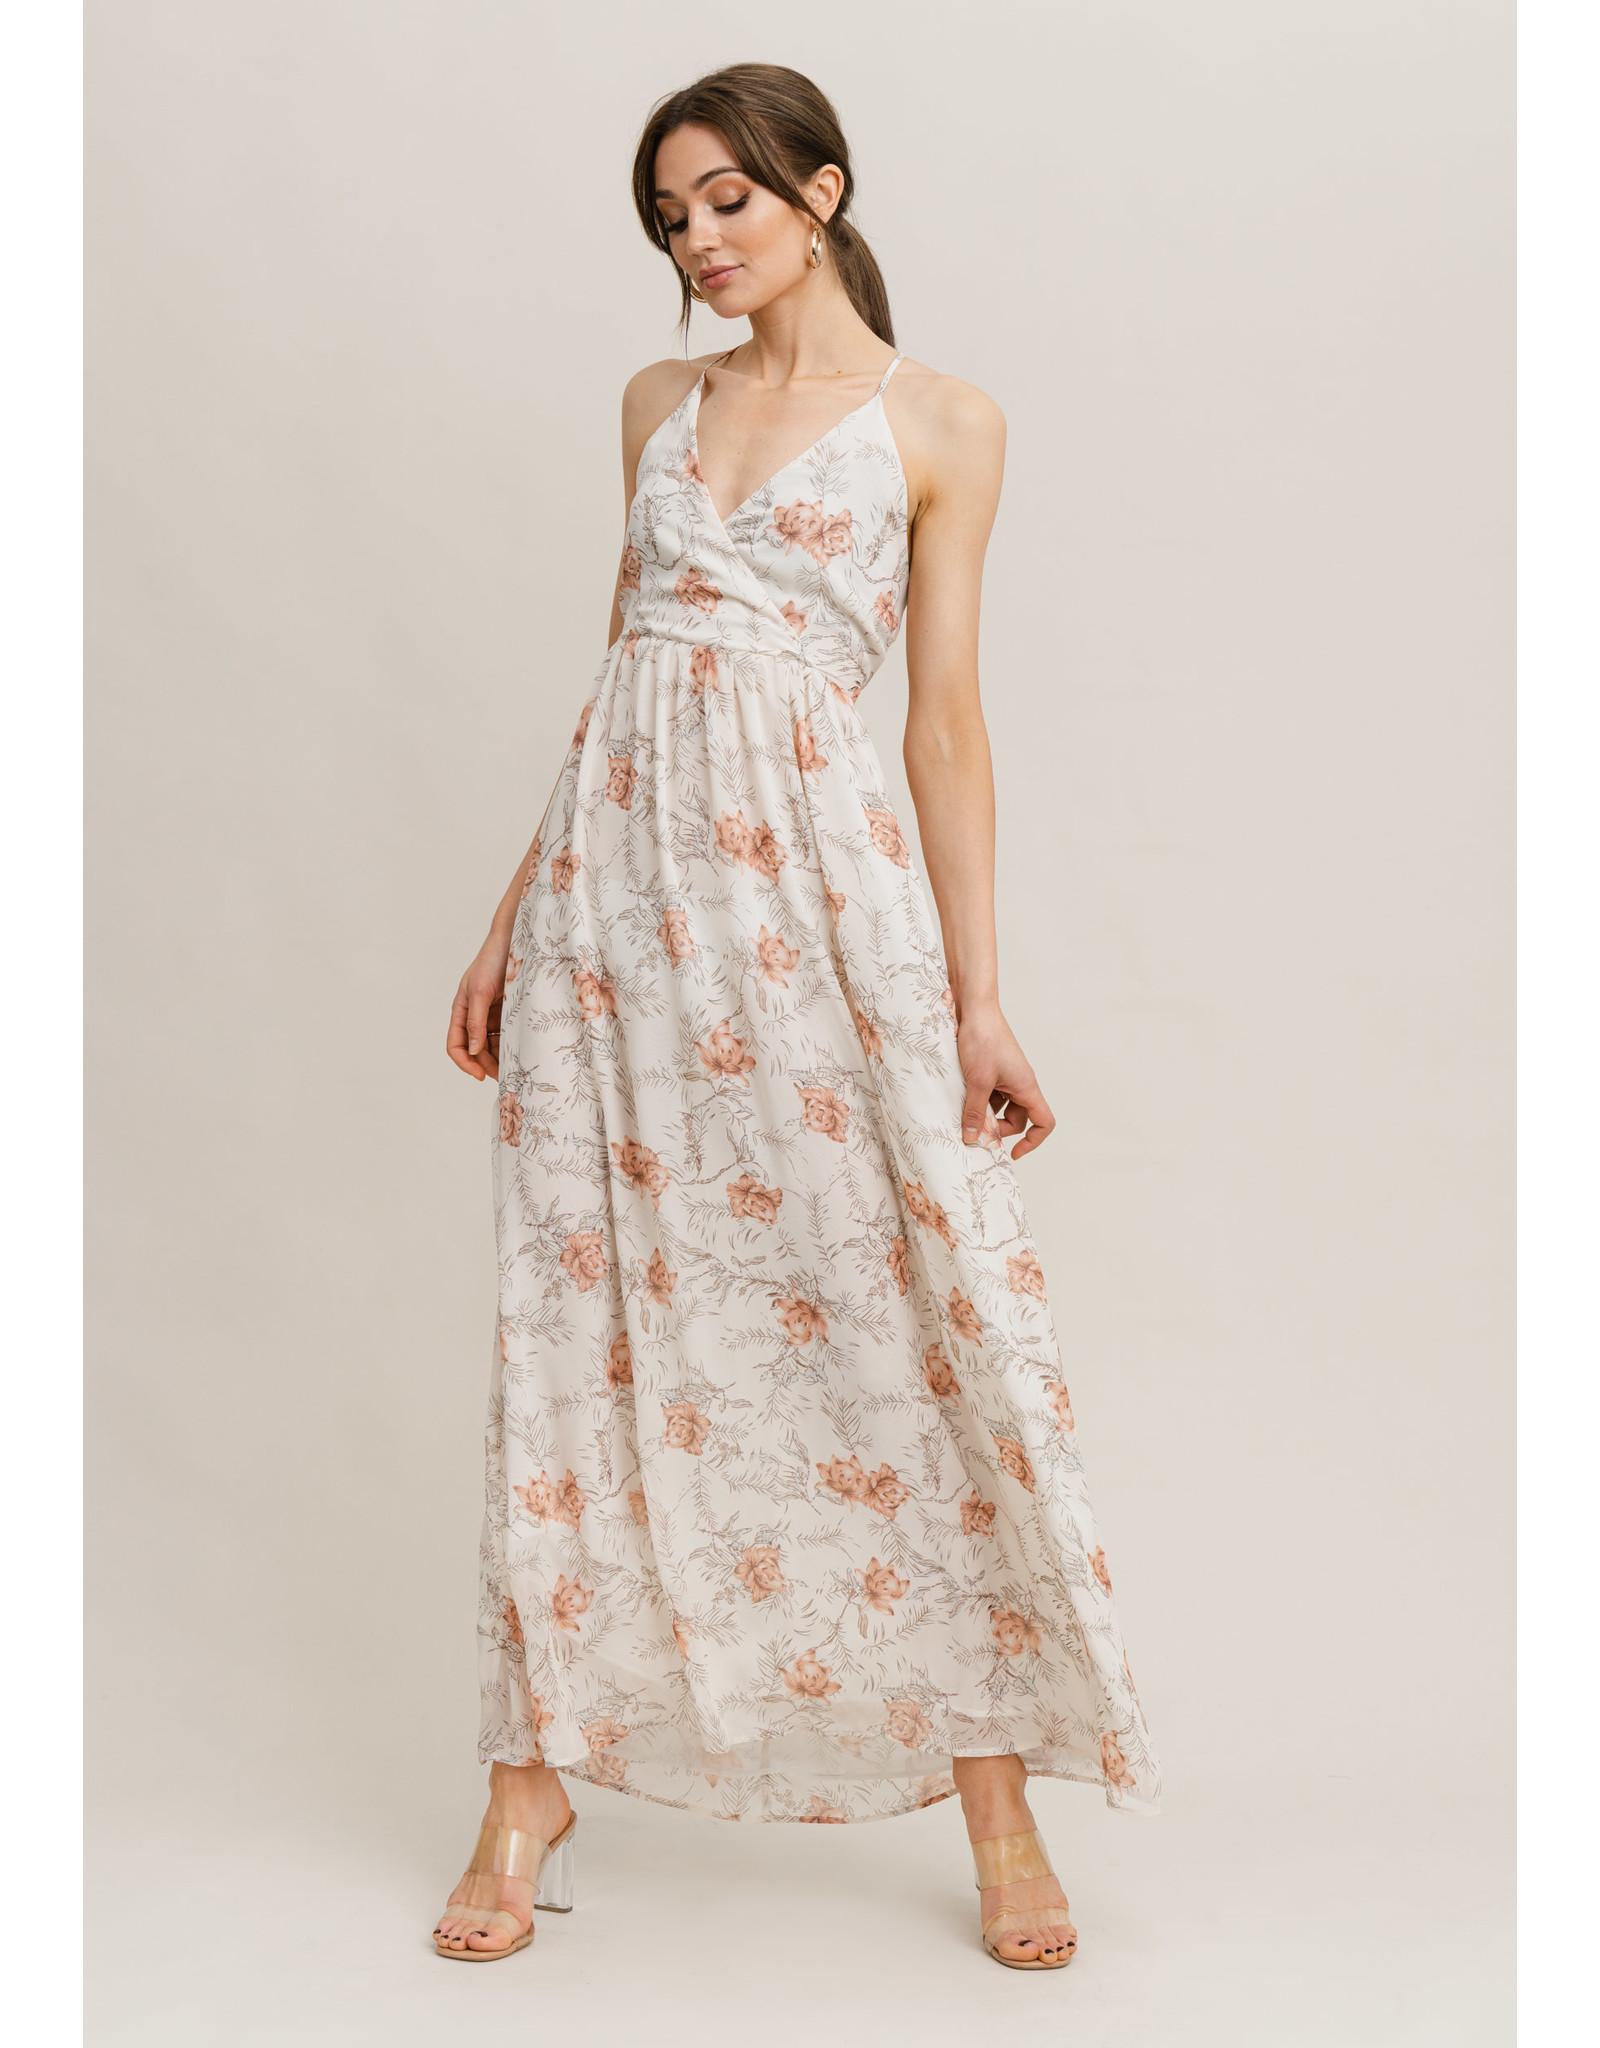 MAXI FLOWER DRESS ORANGE